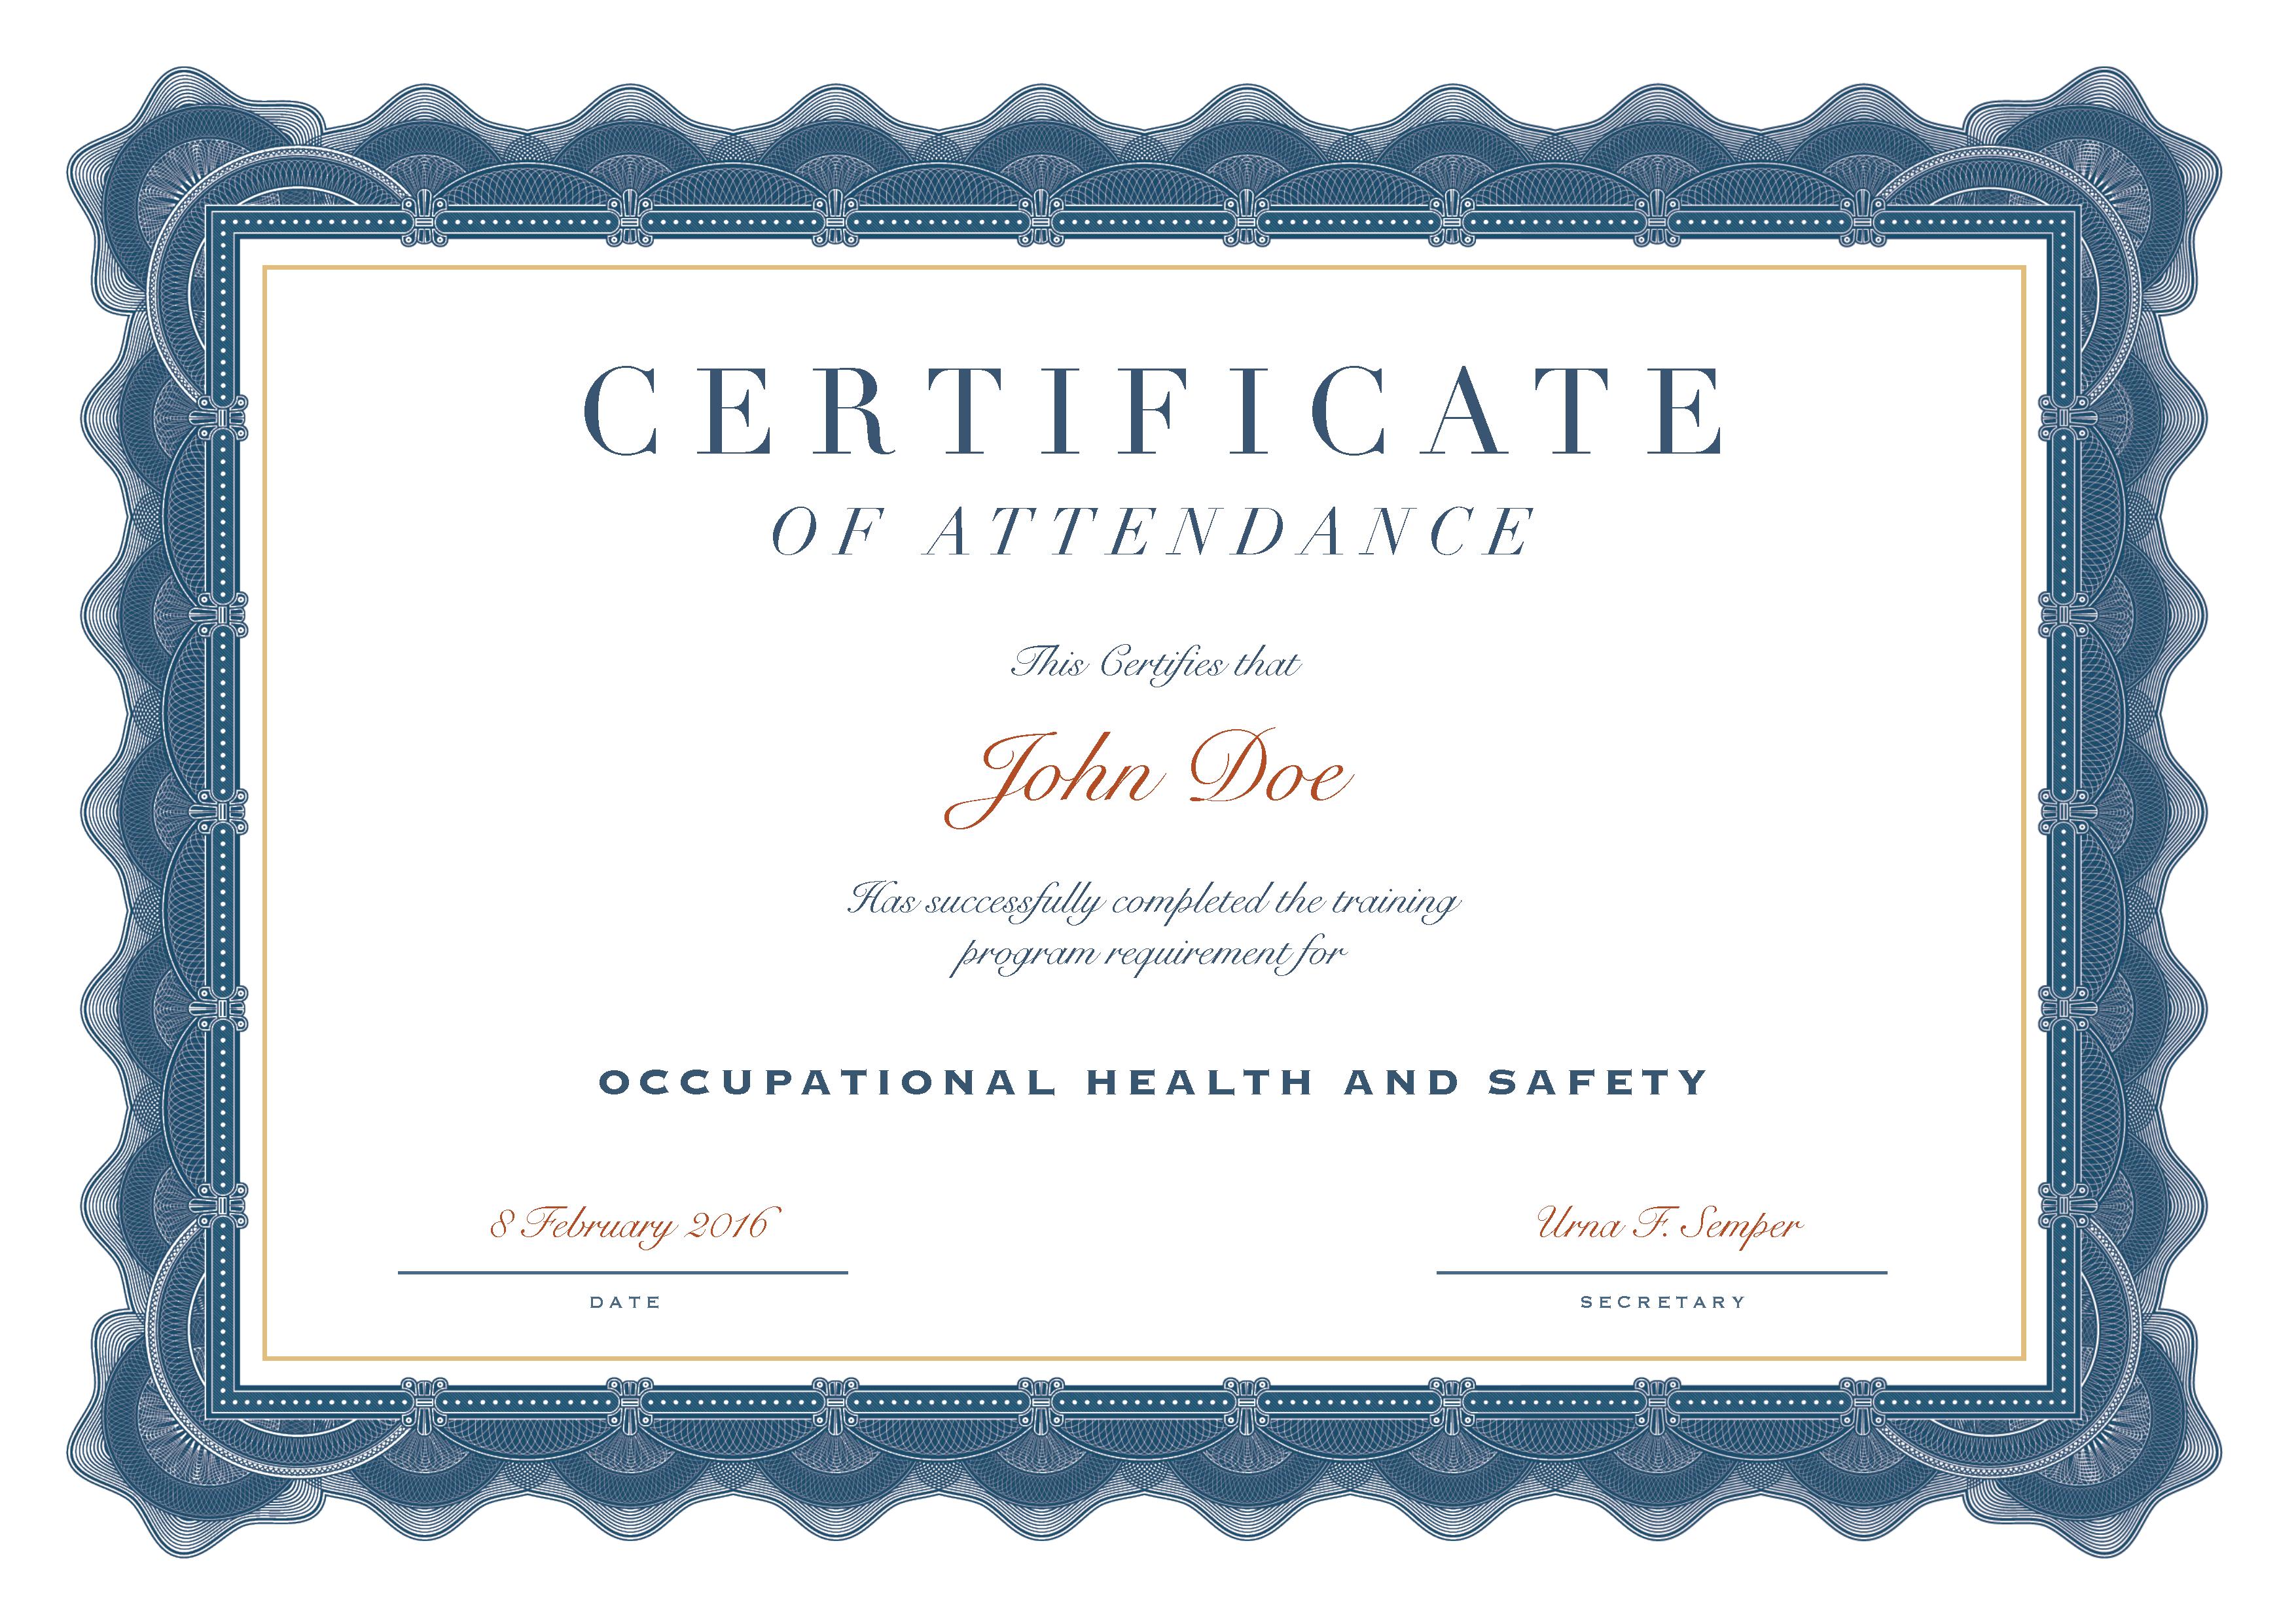 Safety Passport of John Doe